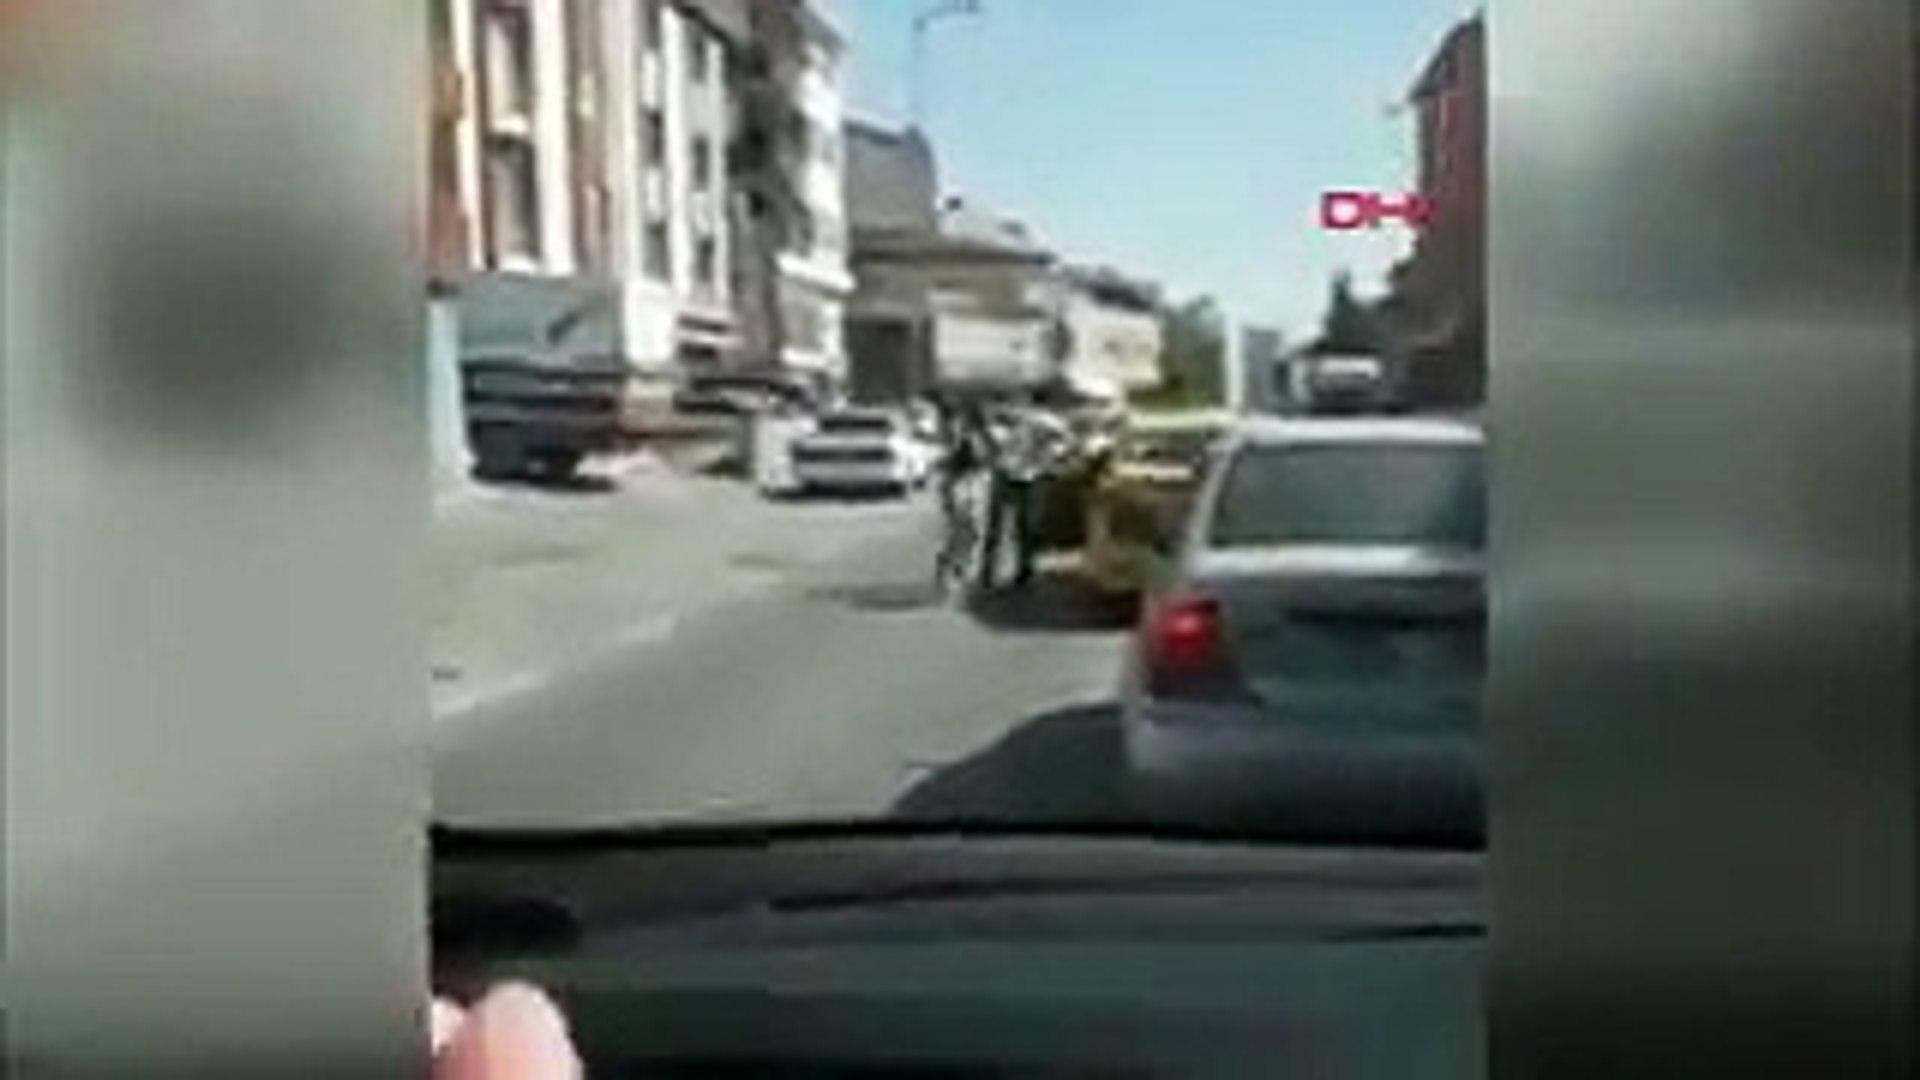 Taksi şoförü, kadın yolcuyu bacağından tutup dışarıya attı!